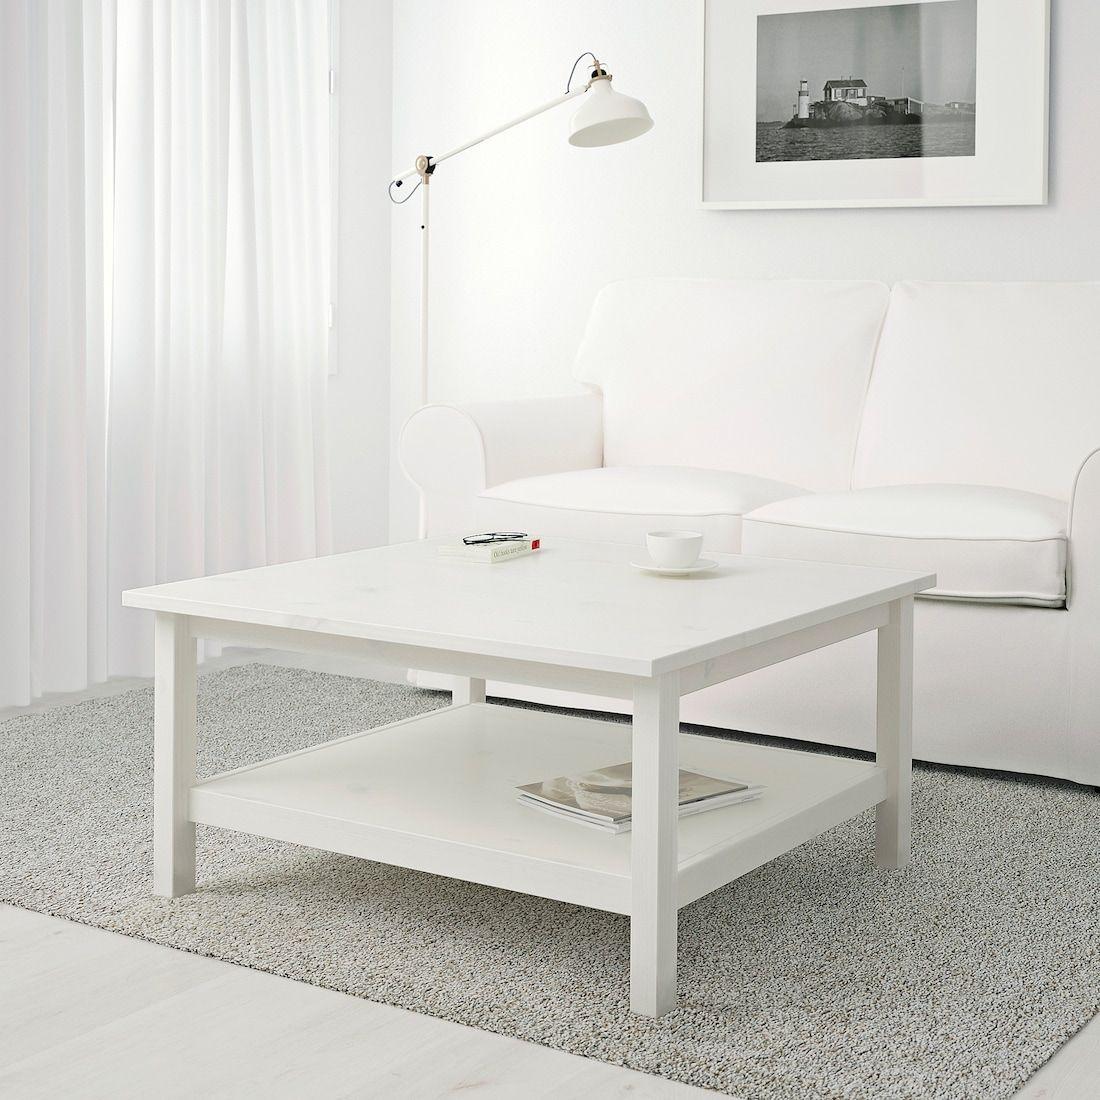 Hemnes Coffee Table White Stain Ikea Ikea Coffee Table Ikea Hemnes Coffee Table Coffee Table White [ 1100 x 1100 Pixel ]